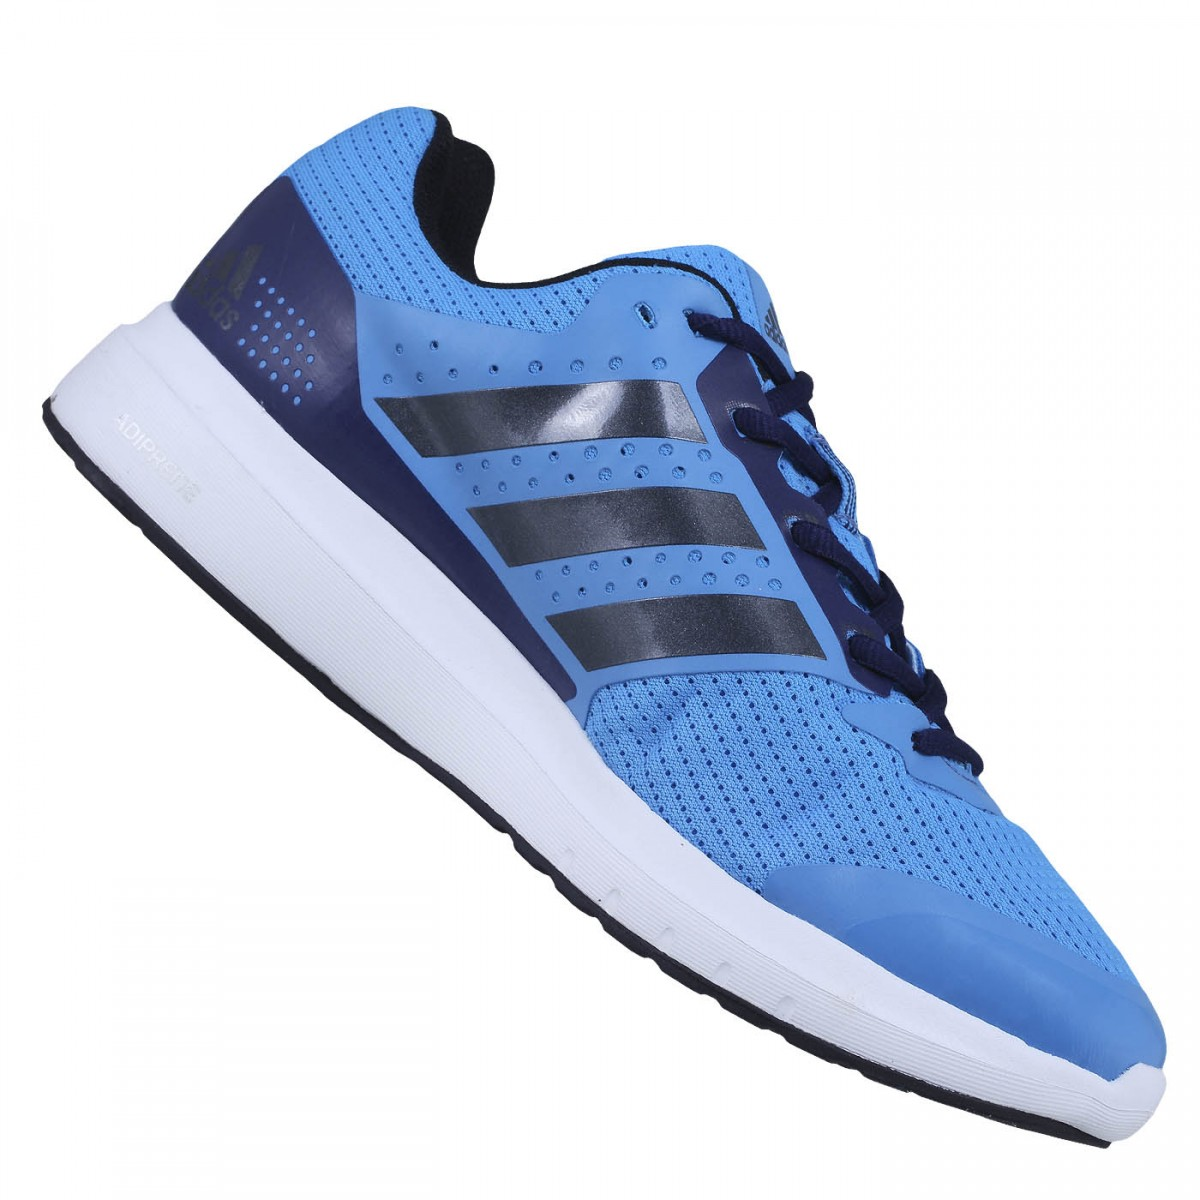 ff2c9da14f8 Tênis Adidas Duramo 7 - Masculino